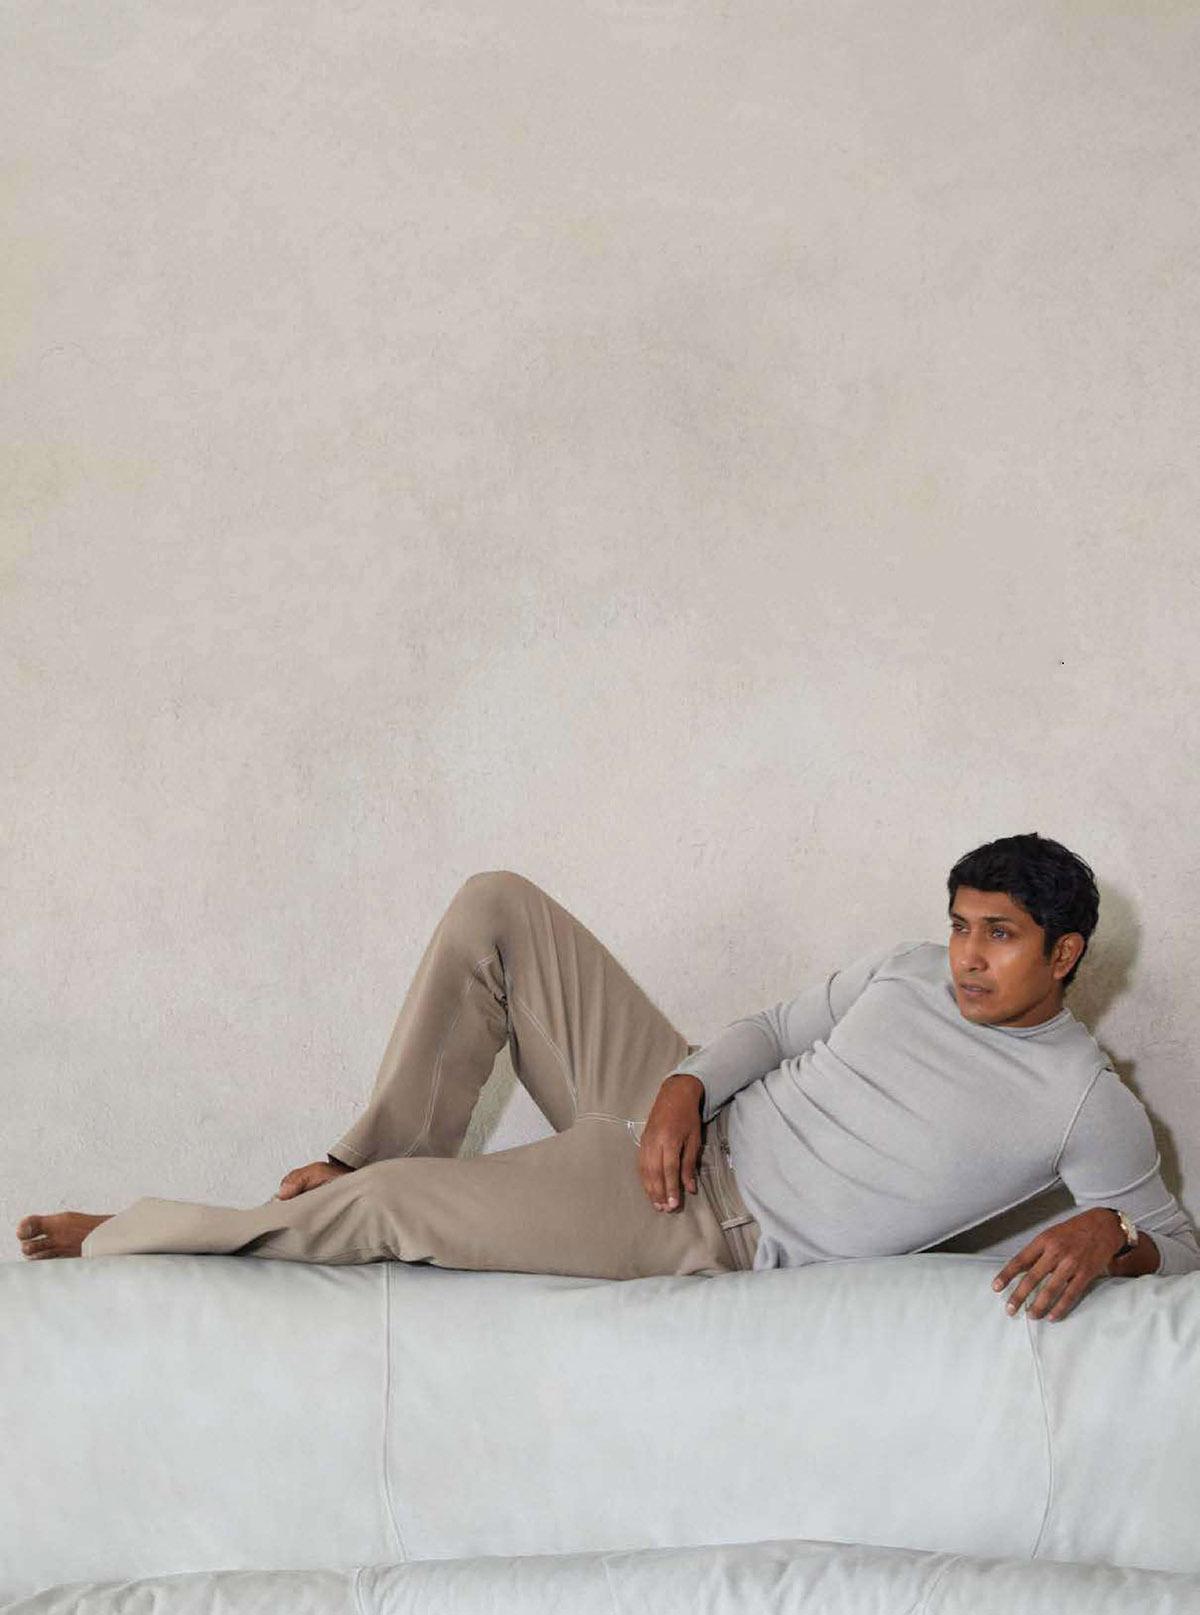 Tenoch Huerta covers GQ Style Mexico & Latin America Spring Summer 2021 by Gustavo García-Villa